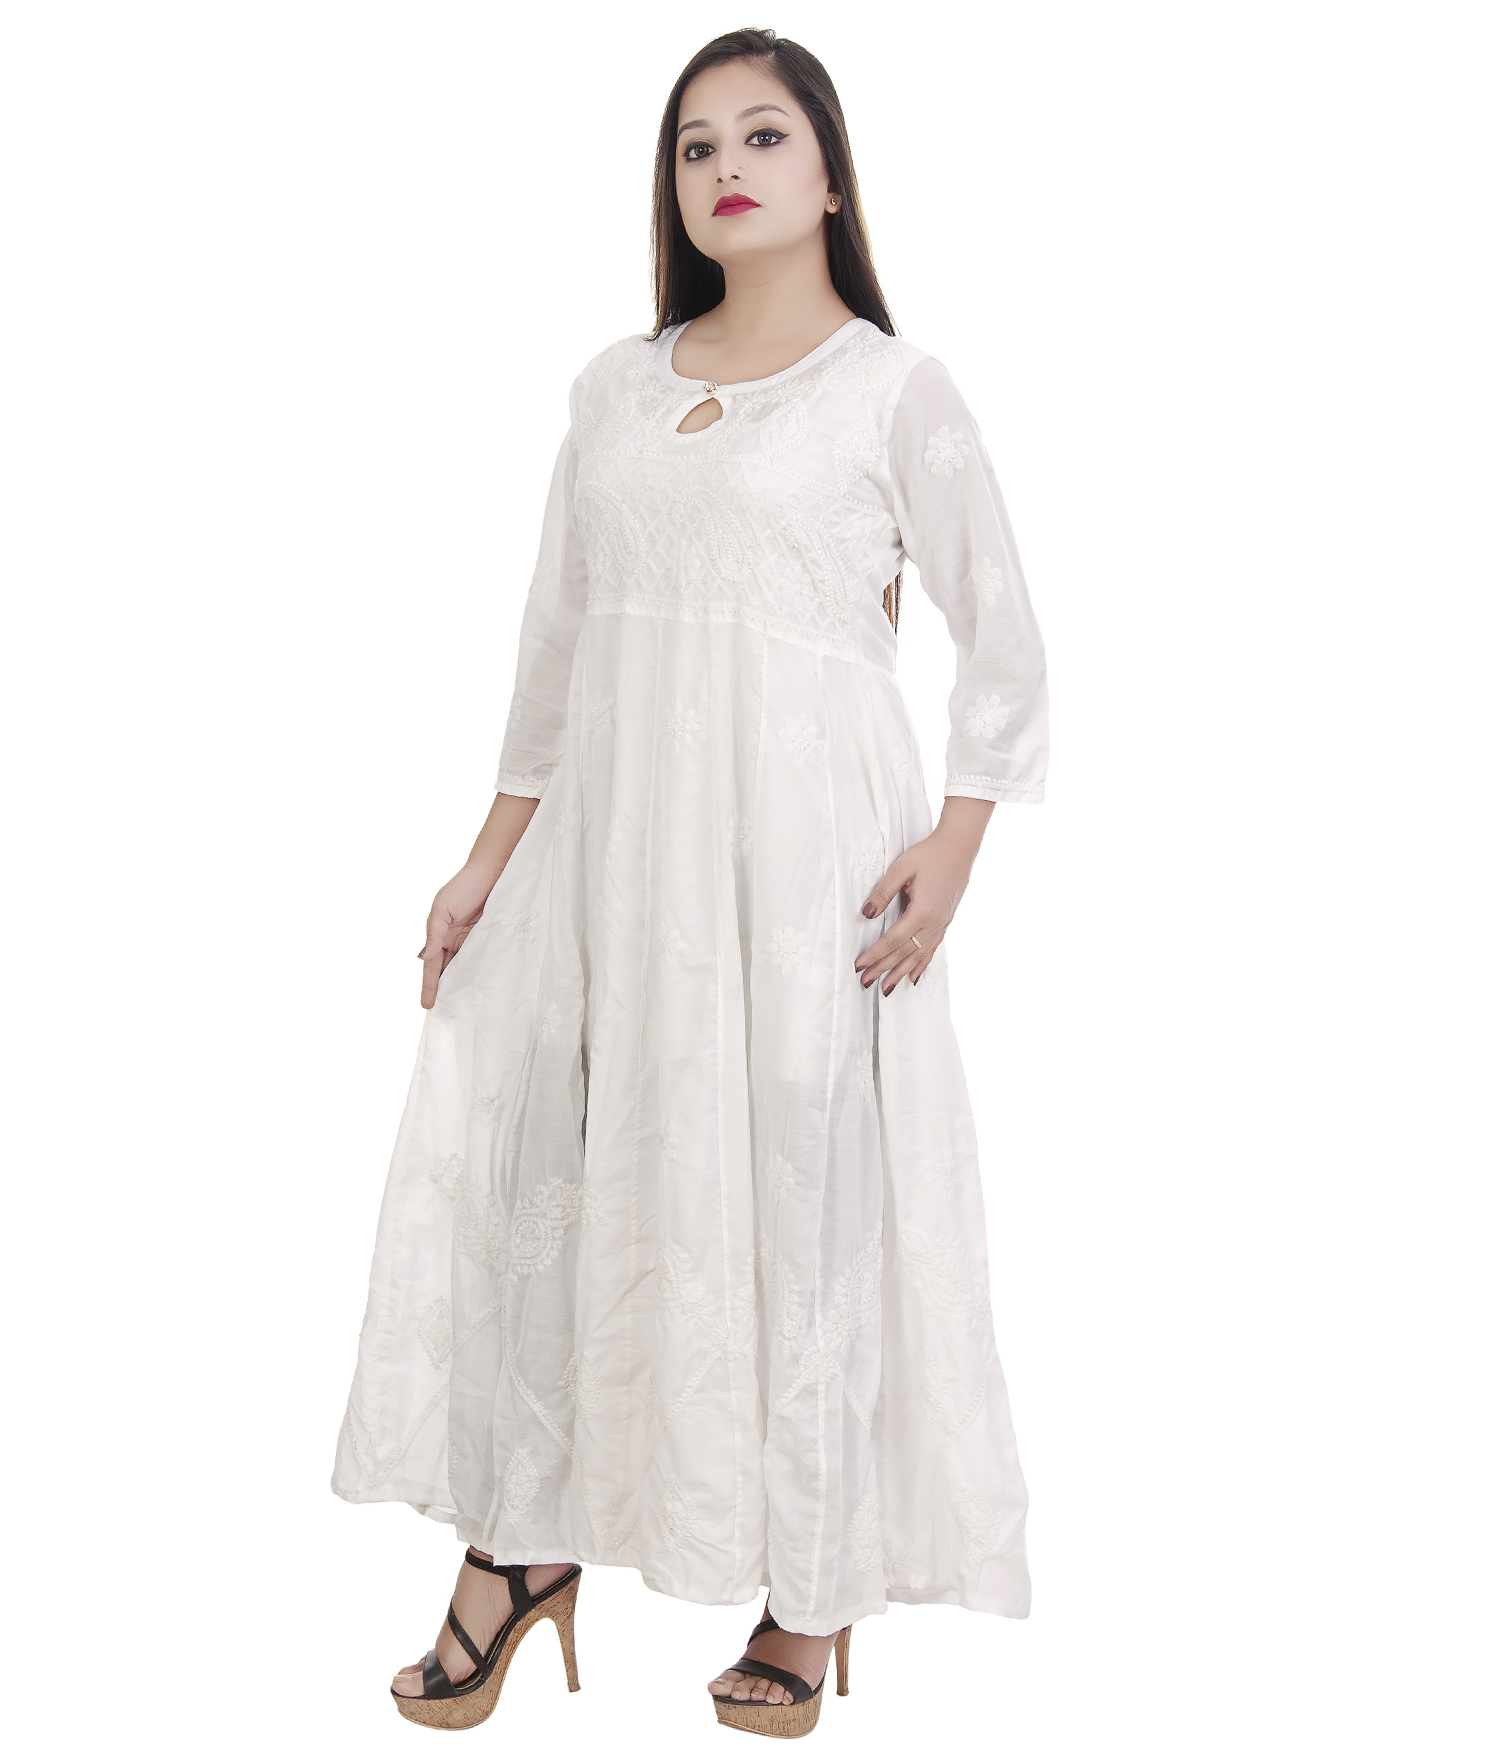 Ethnava Hand Embroidered Muslin Cotton Flared Lucknowi Chikan Kurti